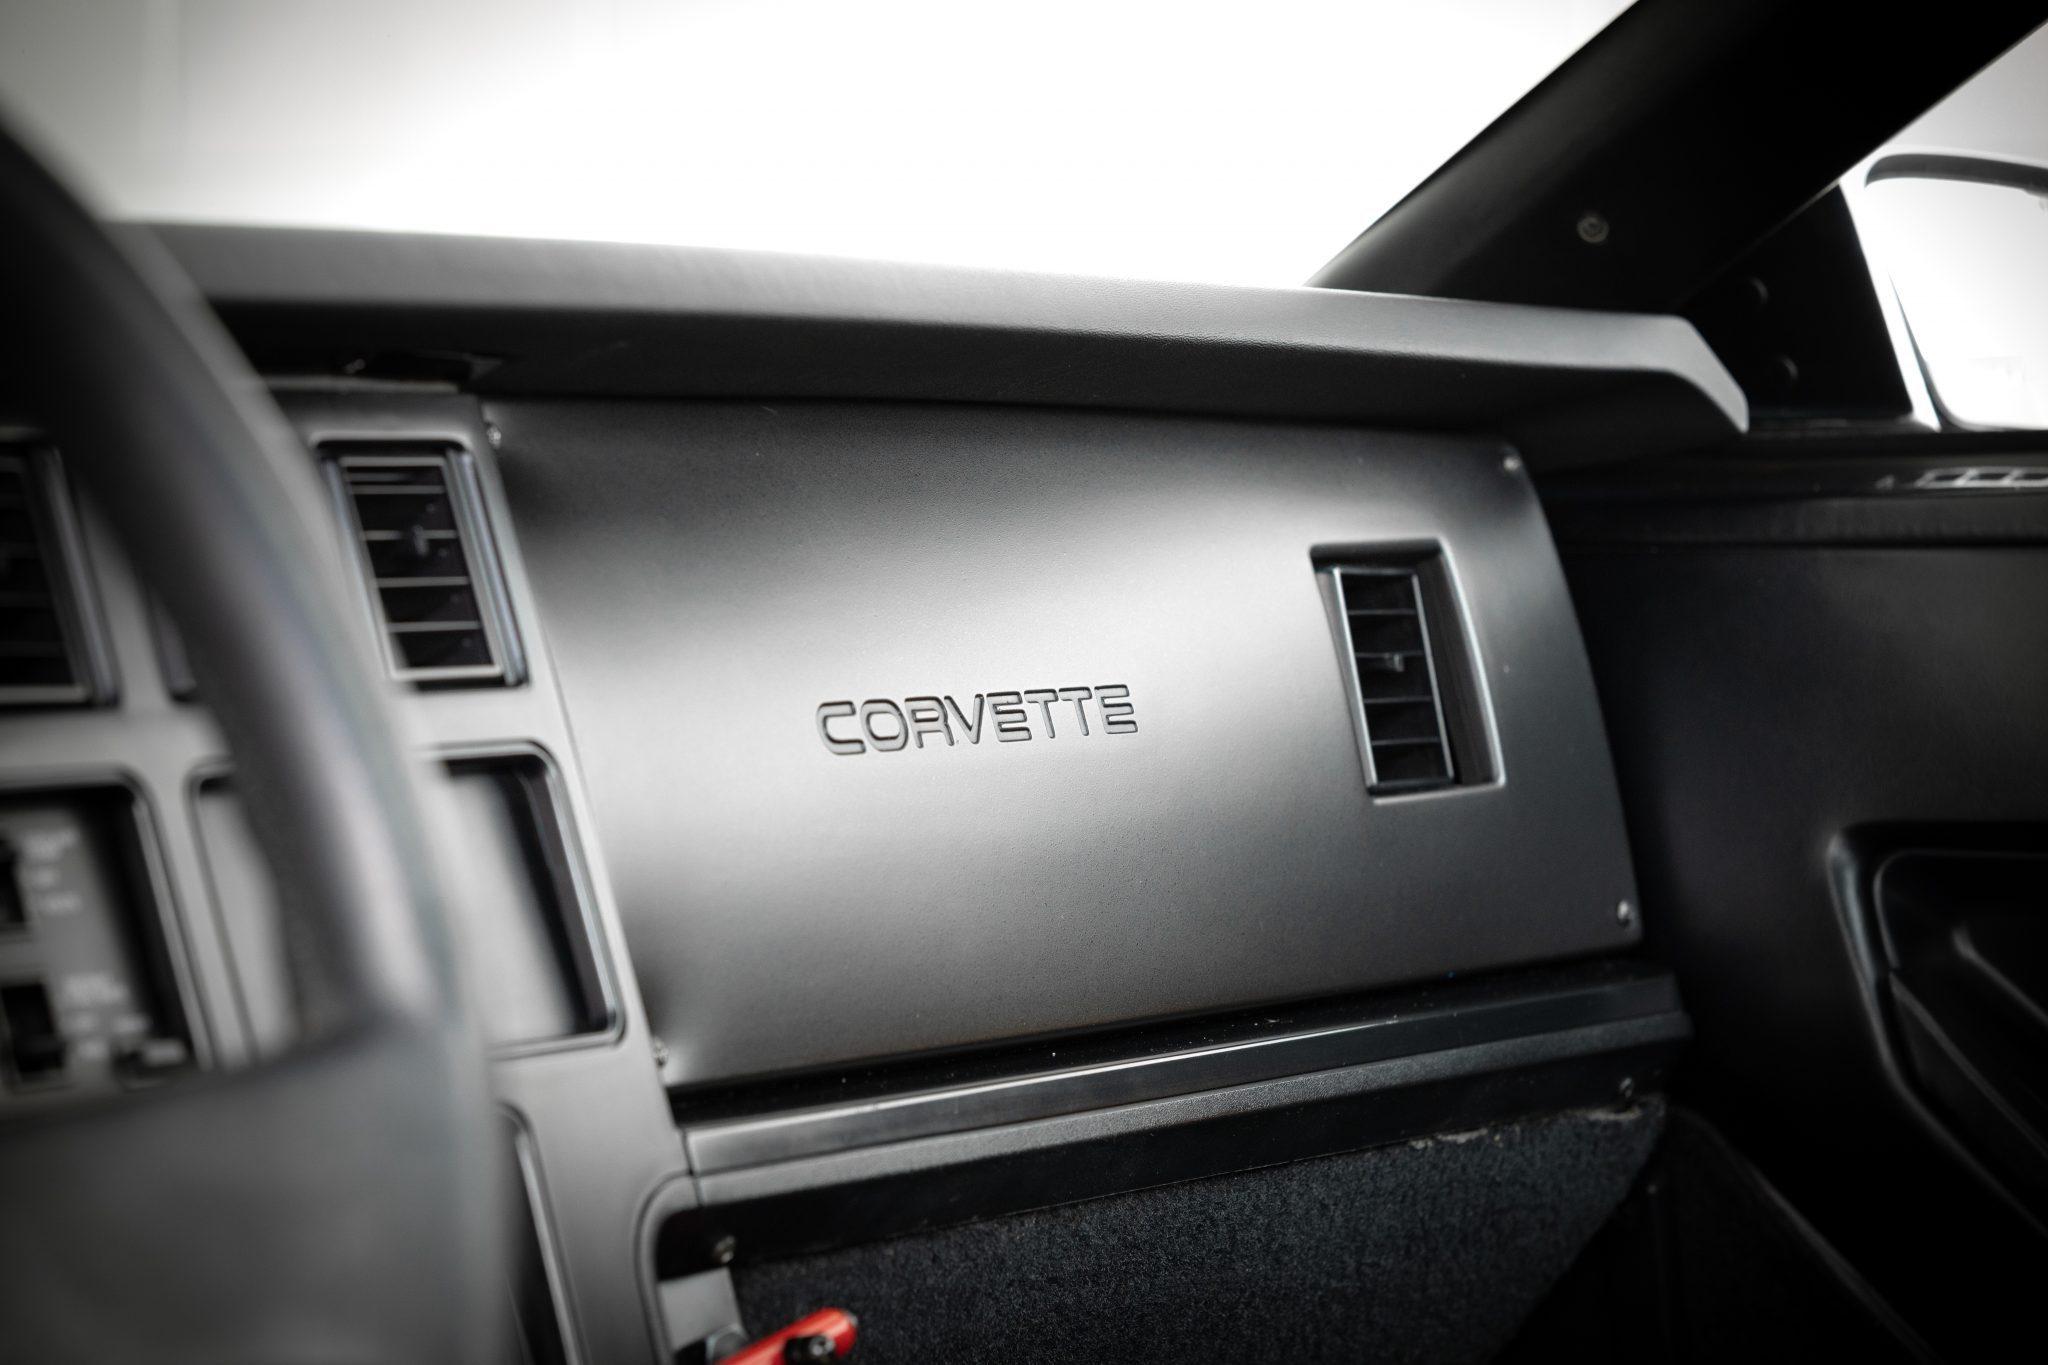 1988 Chevrolet Corvette Callaway SledgeHammer BaT dash interior